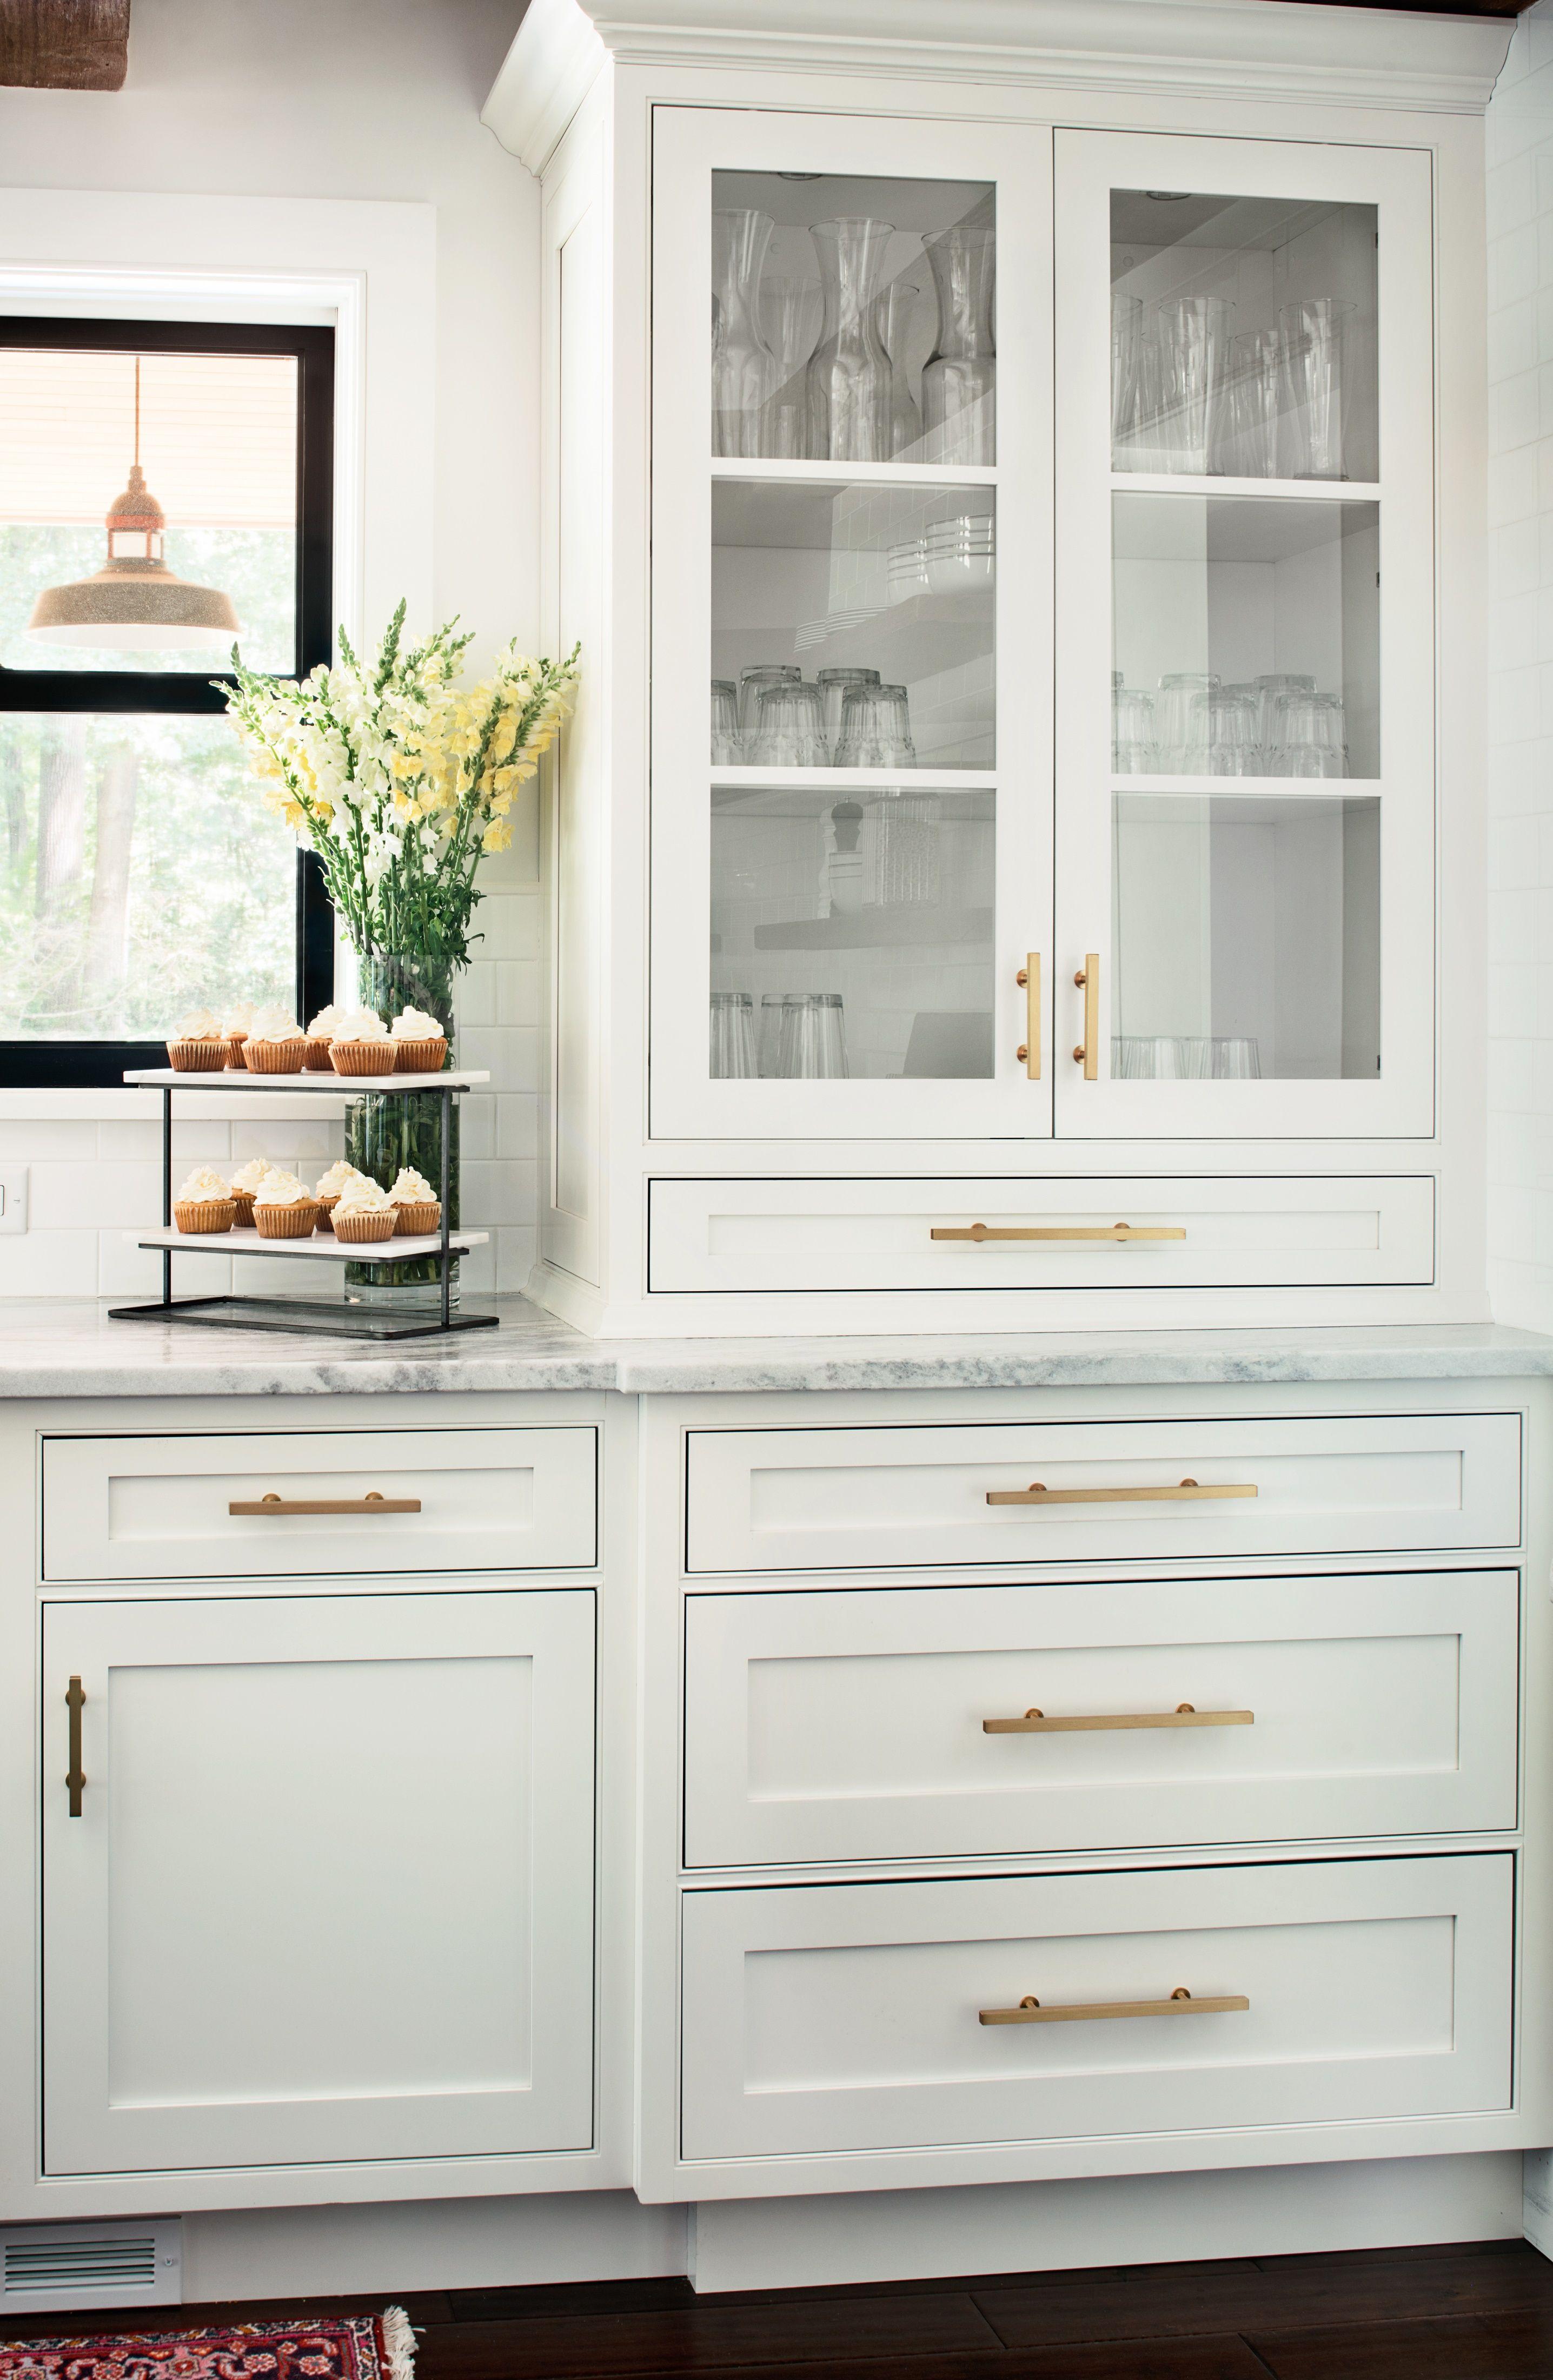 Oakwood Residence Modern Farmhouse Kitchen Z Interiors Glass Kitchen Cabinets New Kitchen Cabinets Kitchen Renovation